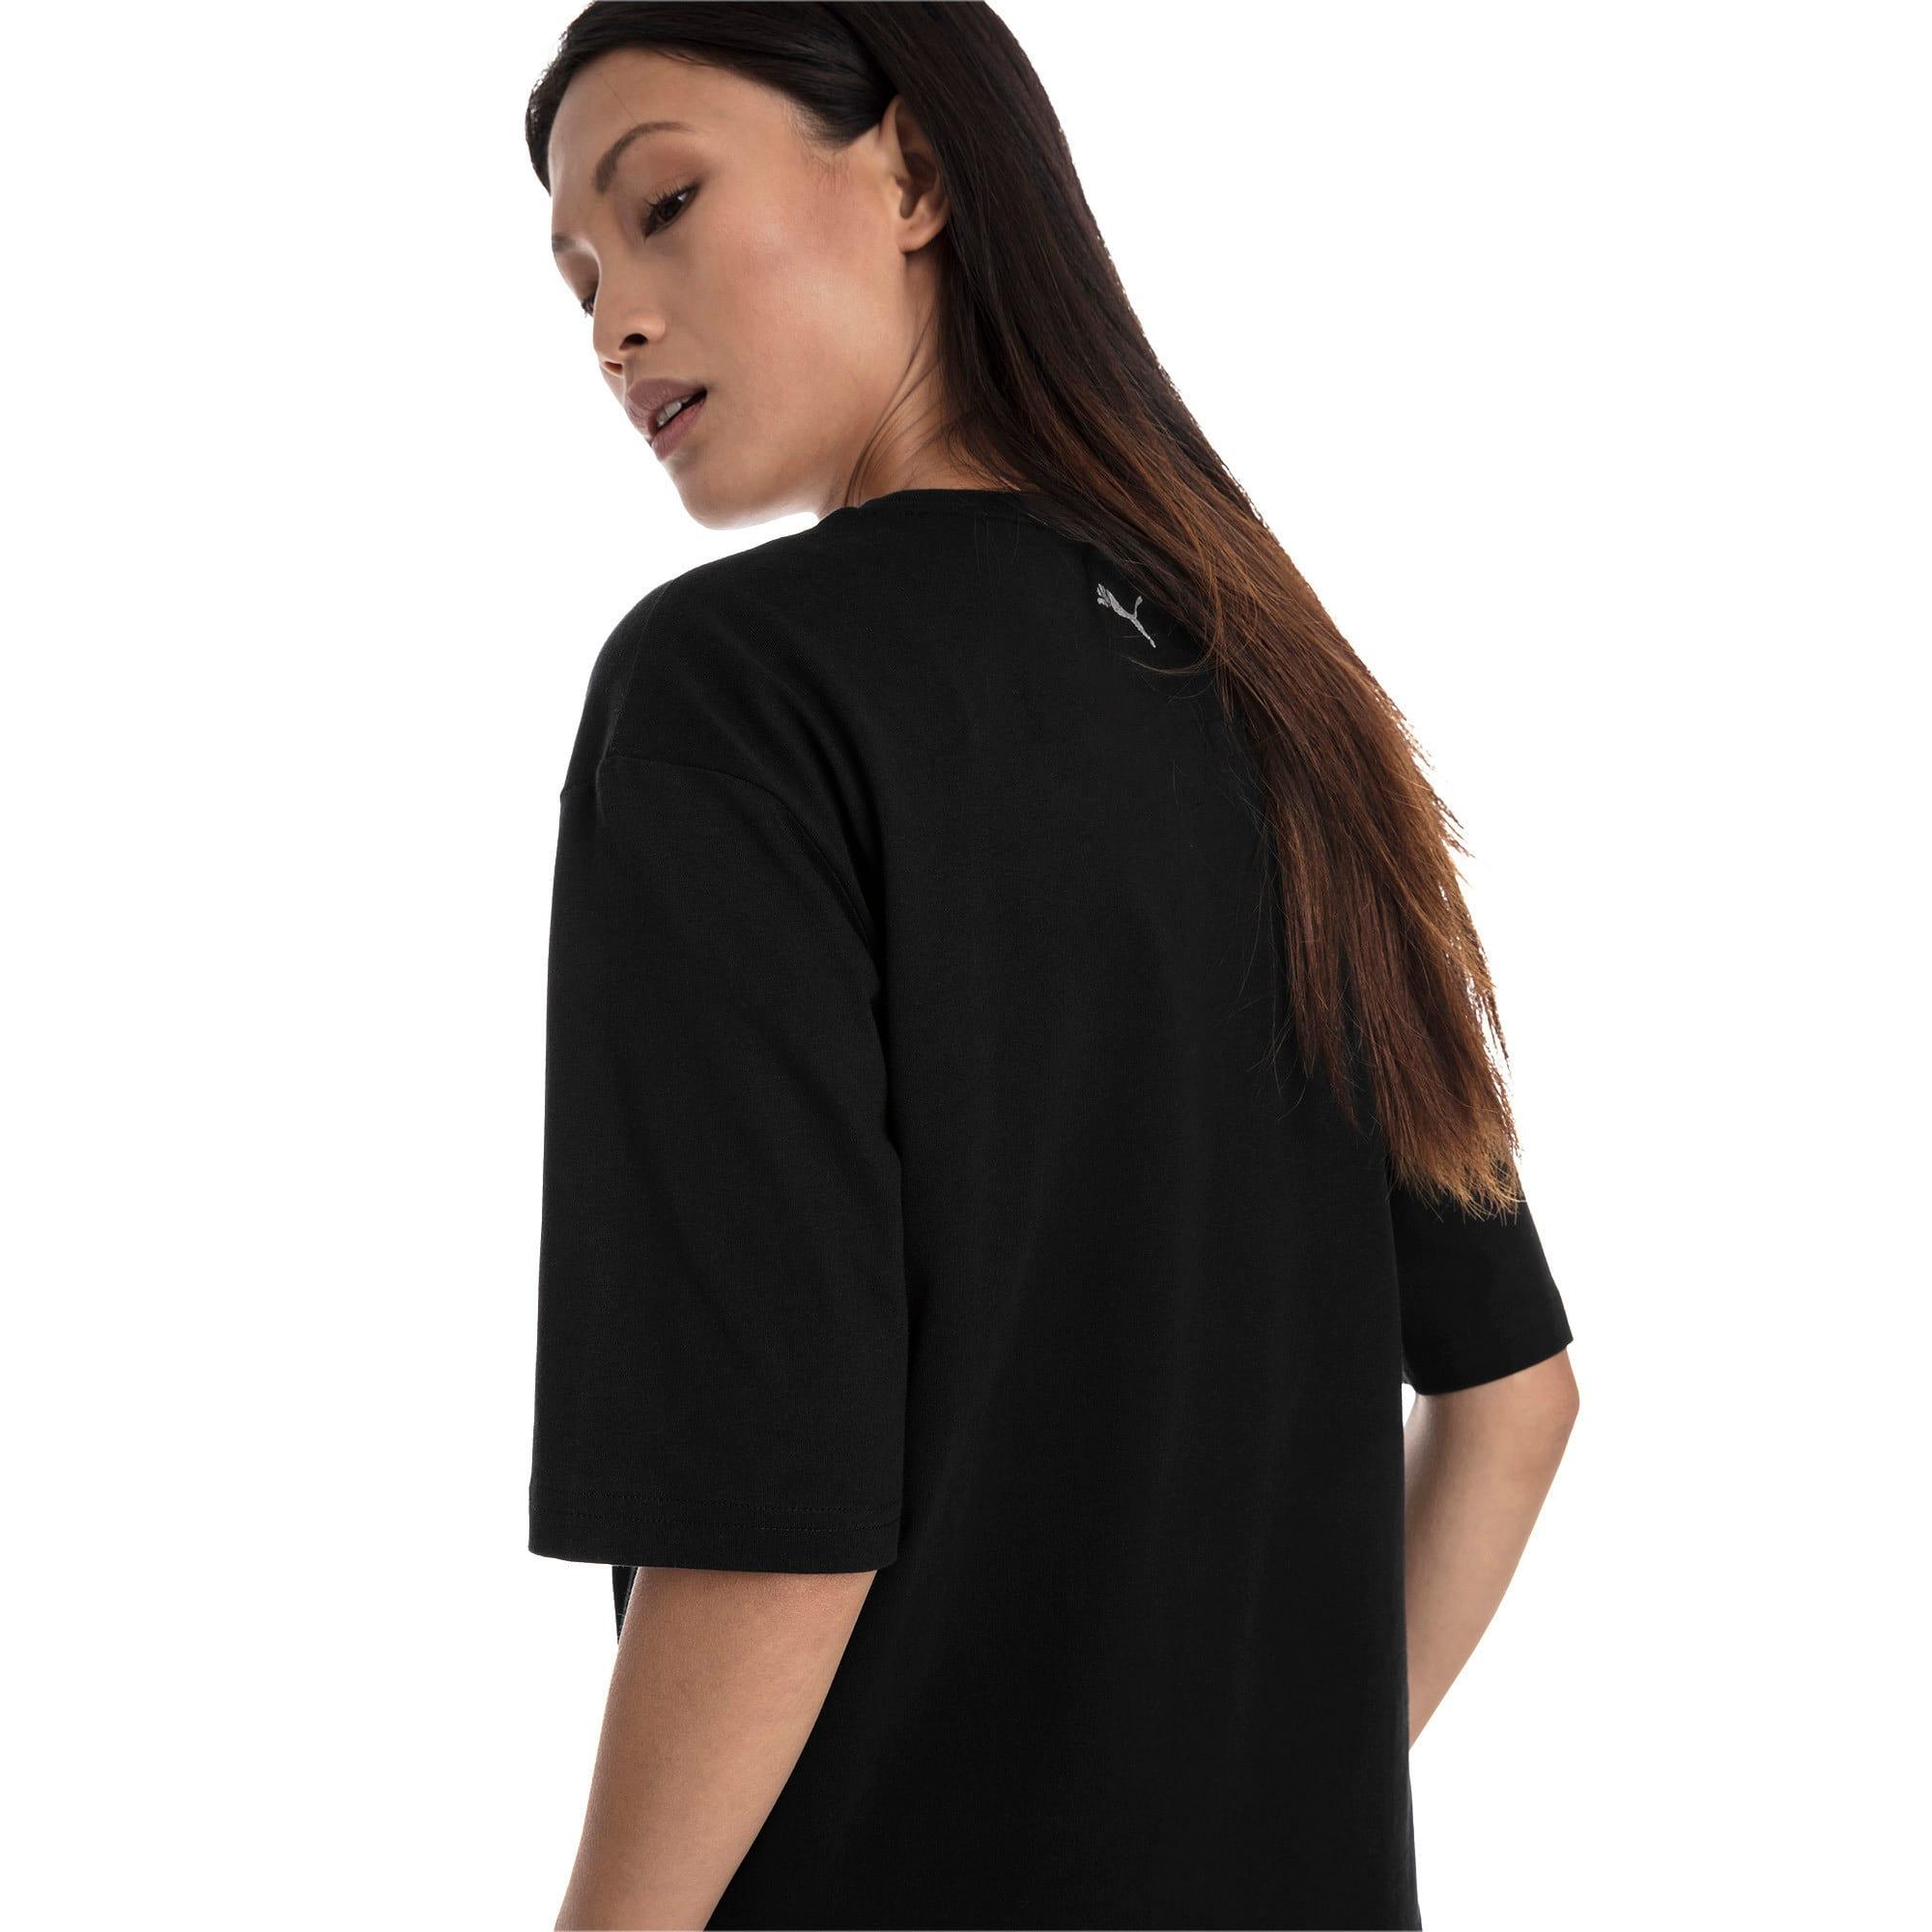 Miniatura 3 de Camiseta Trailblazer para mujer, Cotton Black, mediano